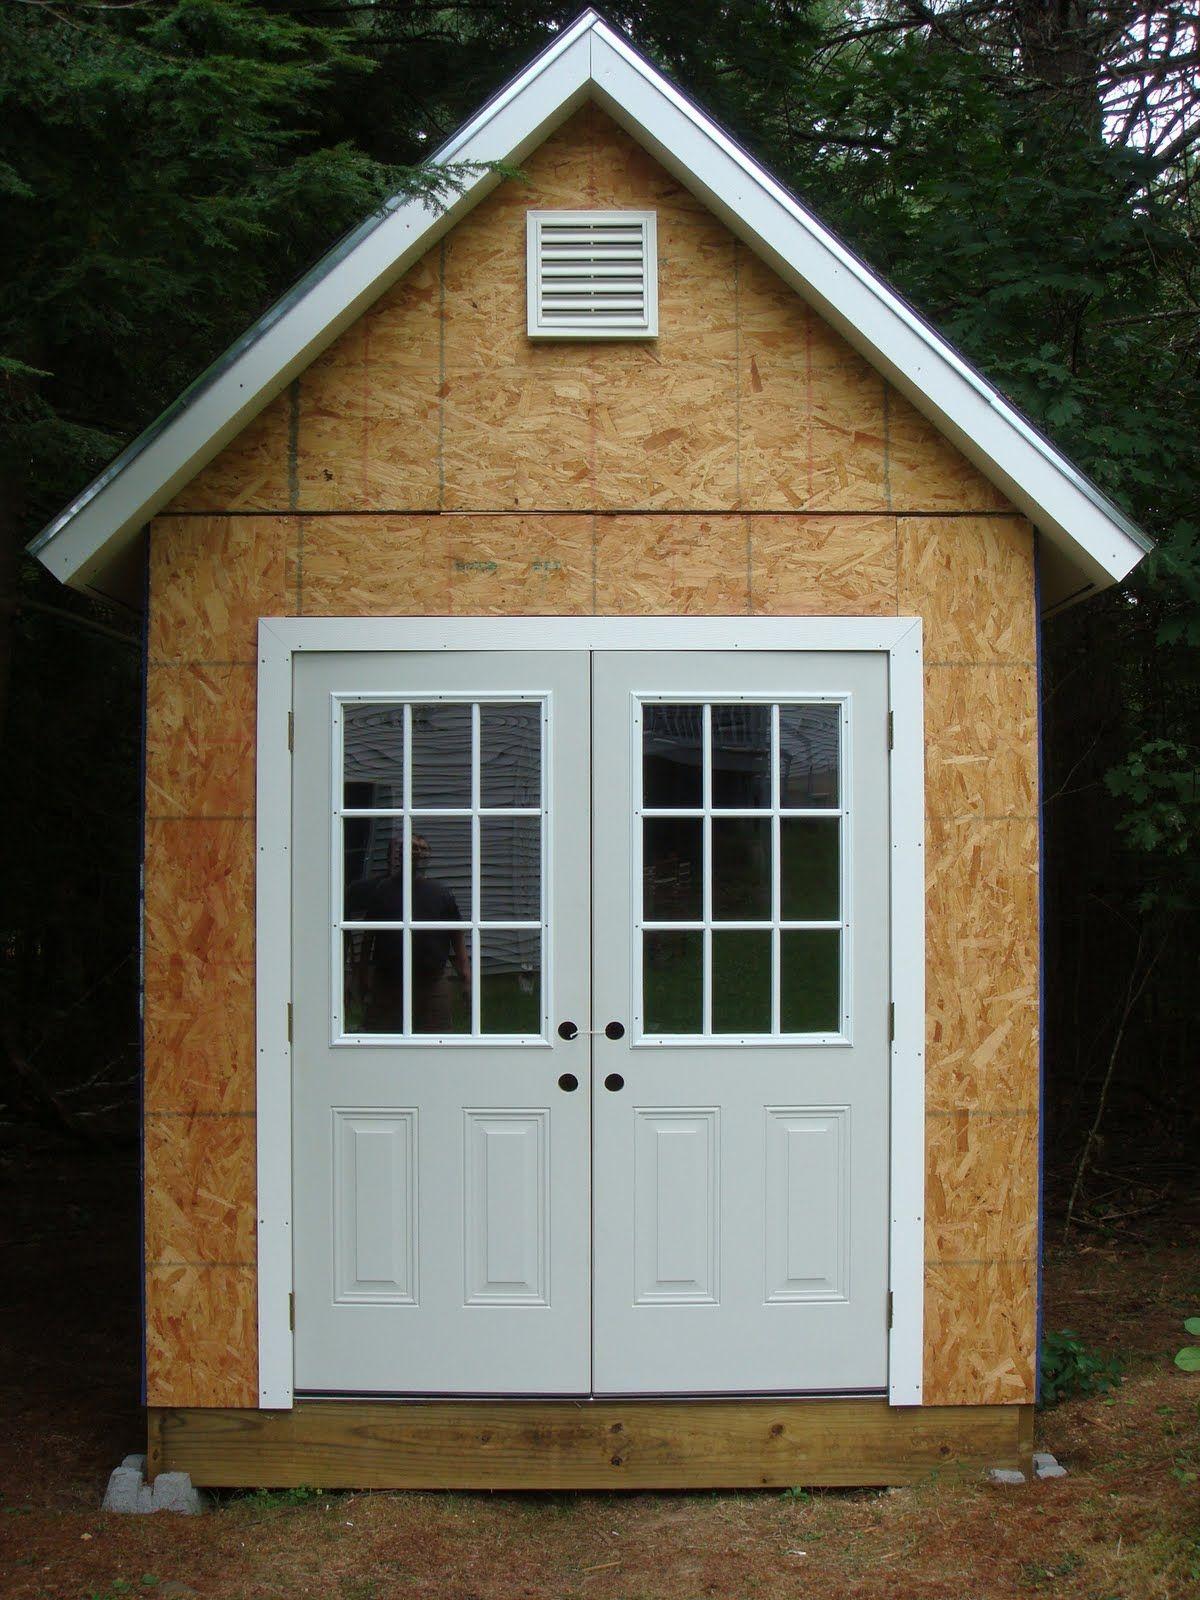 Shed Double Door Plans